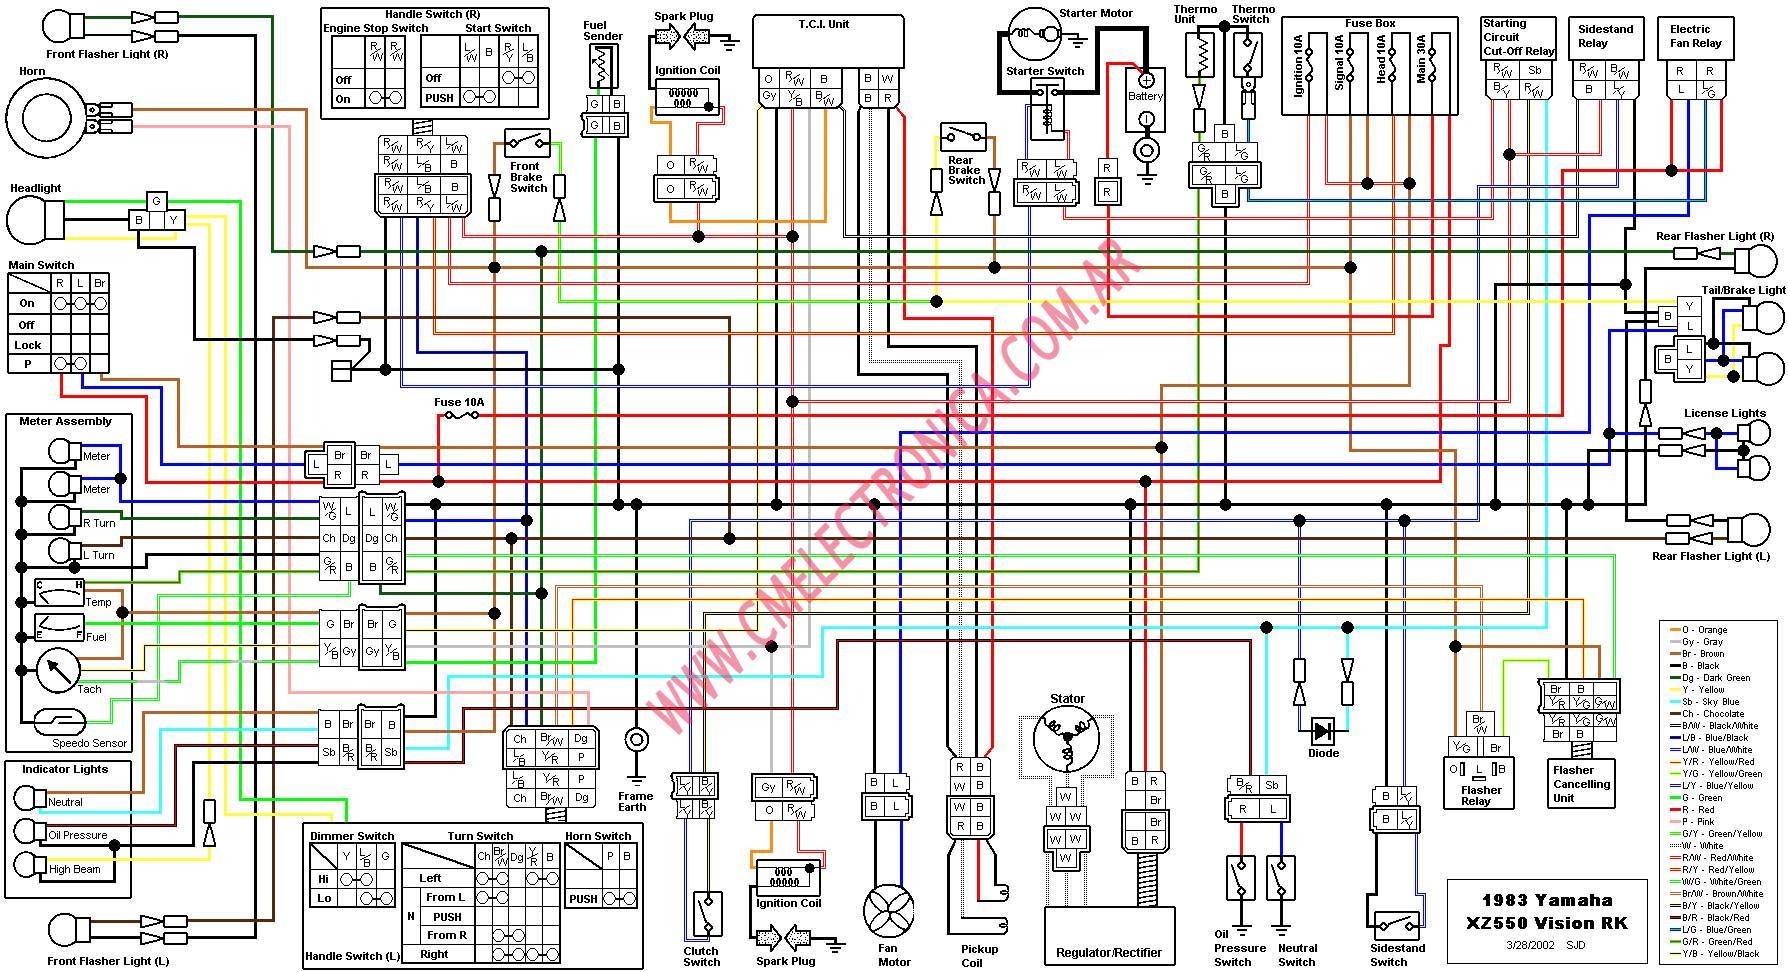 hight resolution of whirlpool refrigerator wiring diagram whirlpool images sensor on ge washing machine motor wiring diagram picture